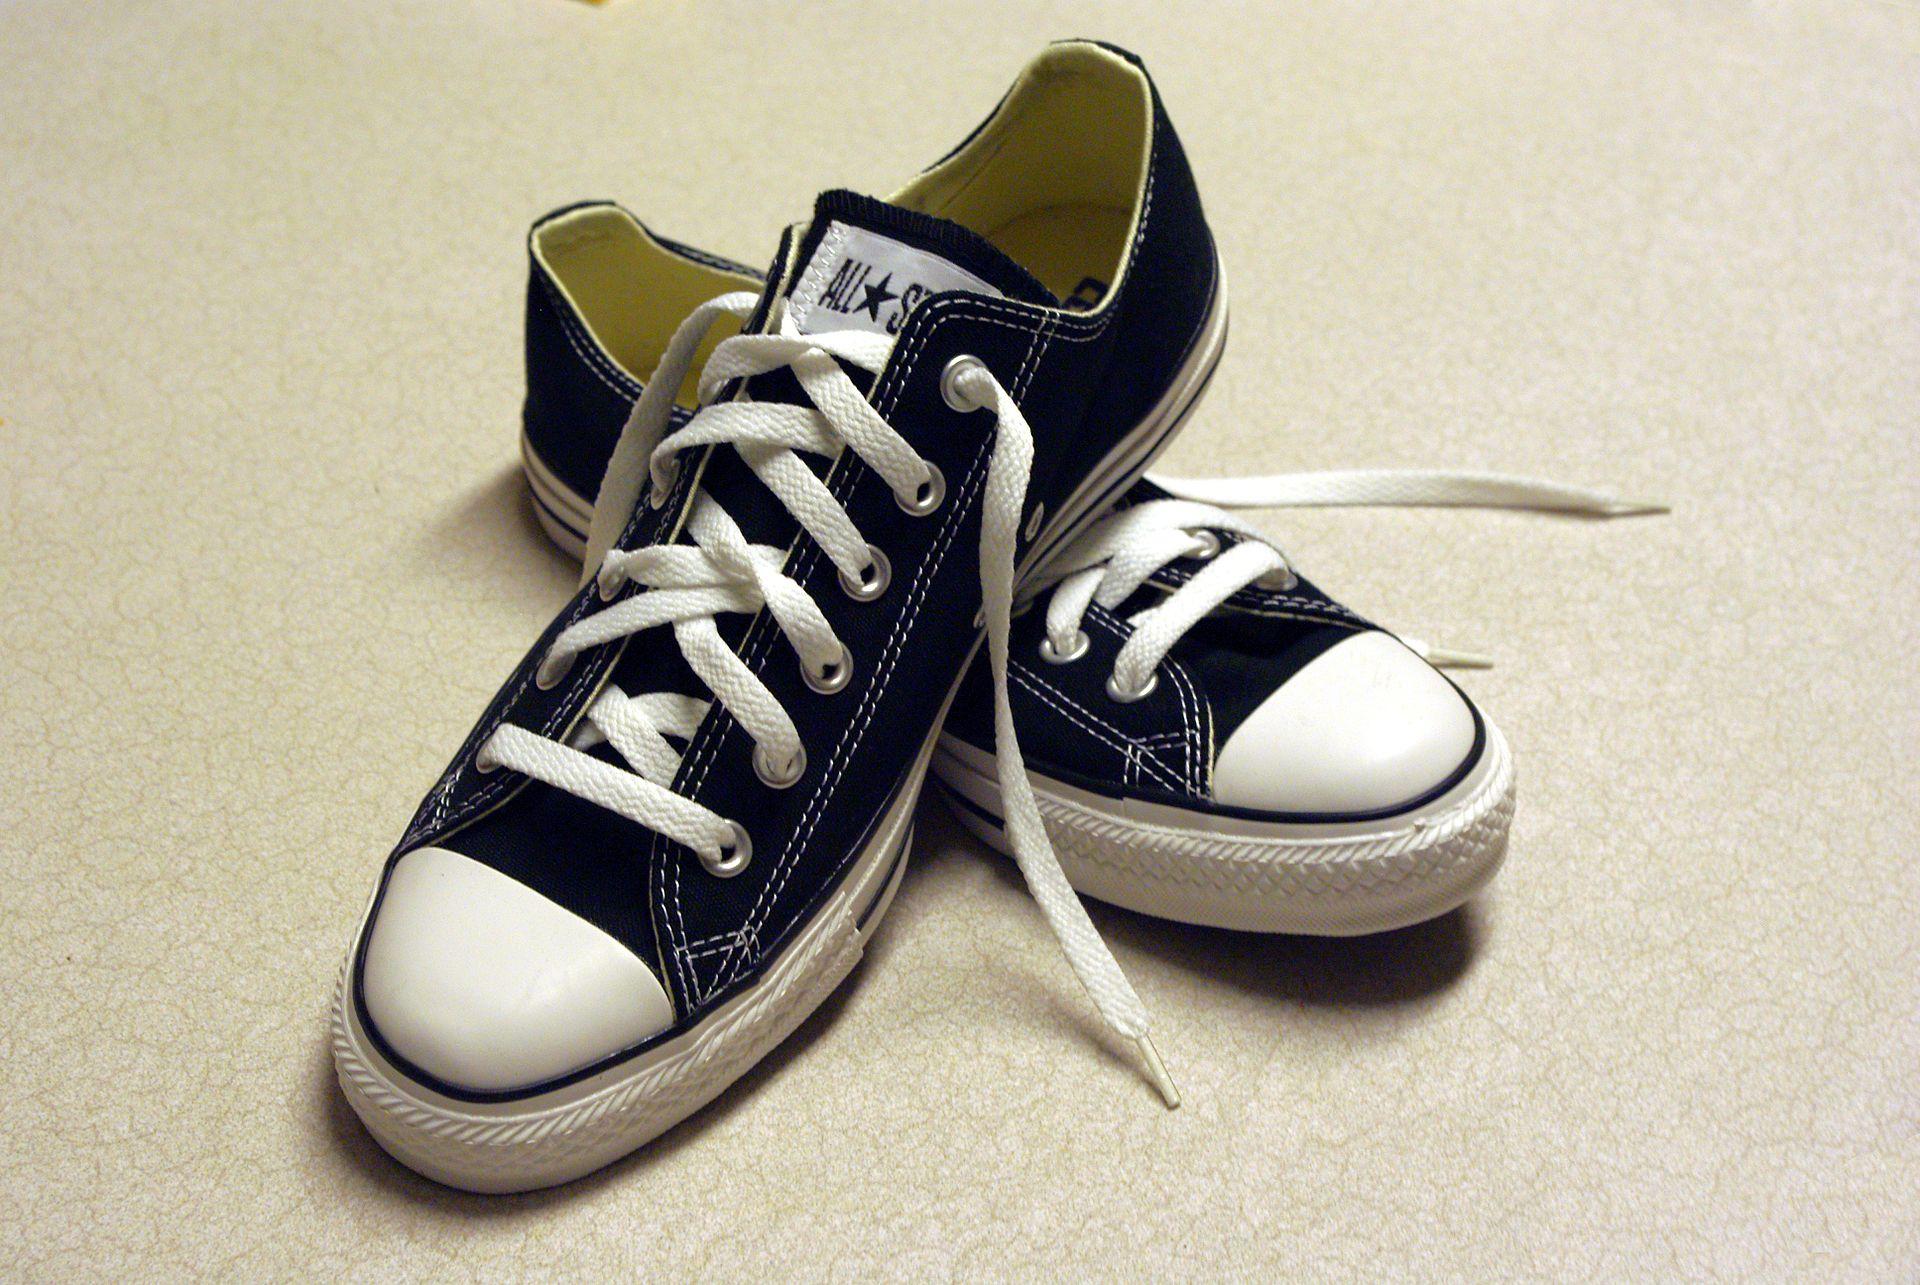 Florida Basketball Shoes